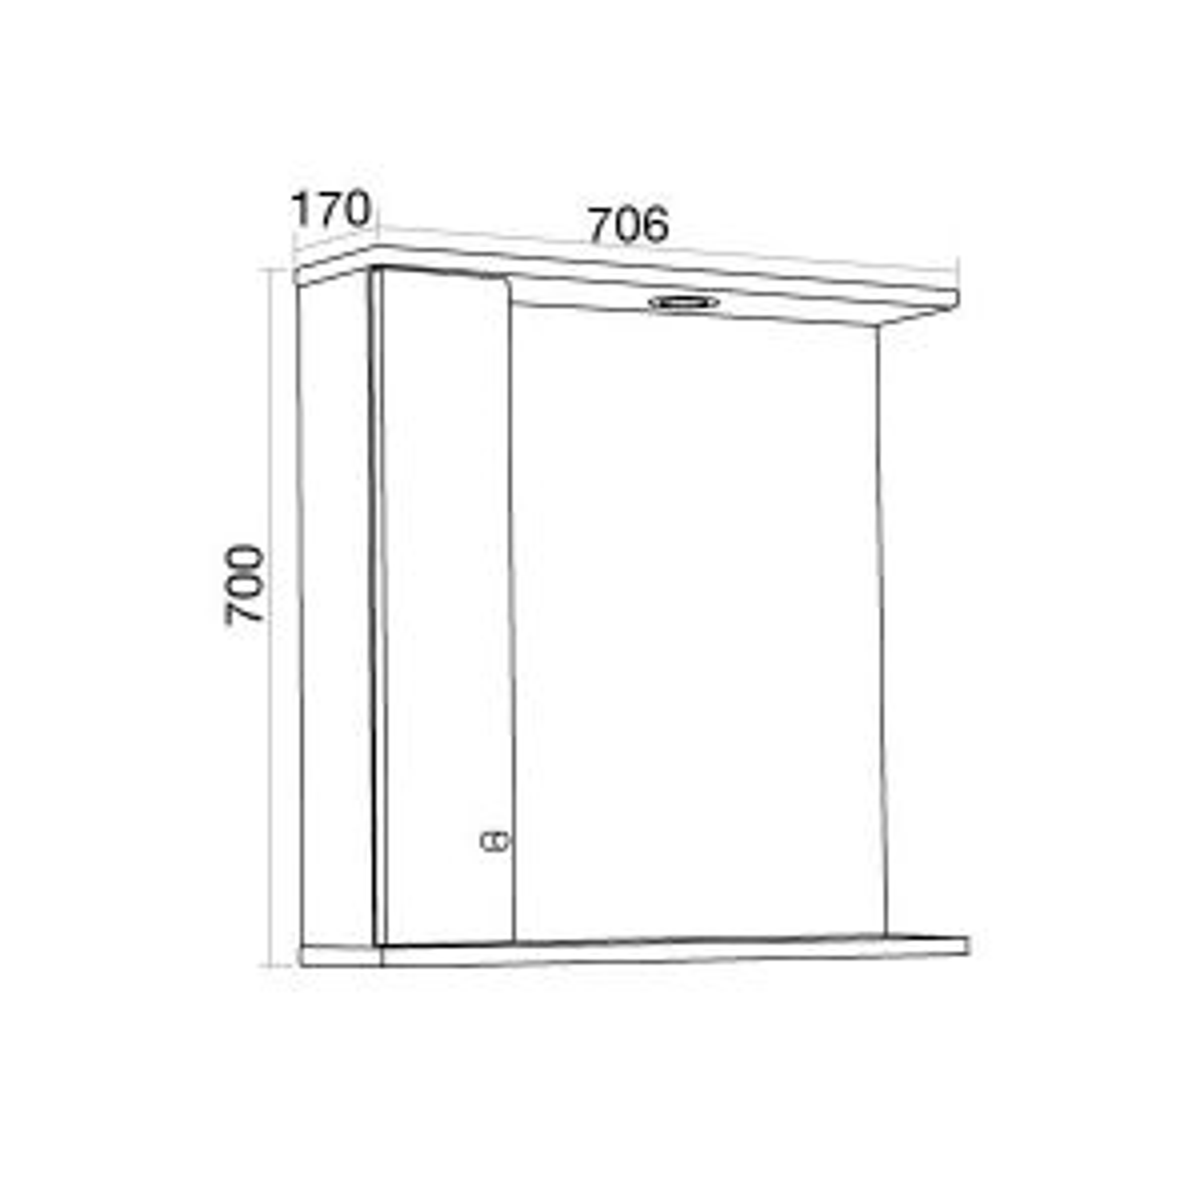 Elation Ikoma Bodega Grey Mirror Unit 750mm Dimensions